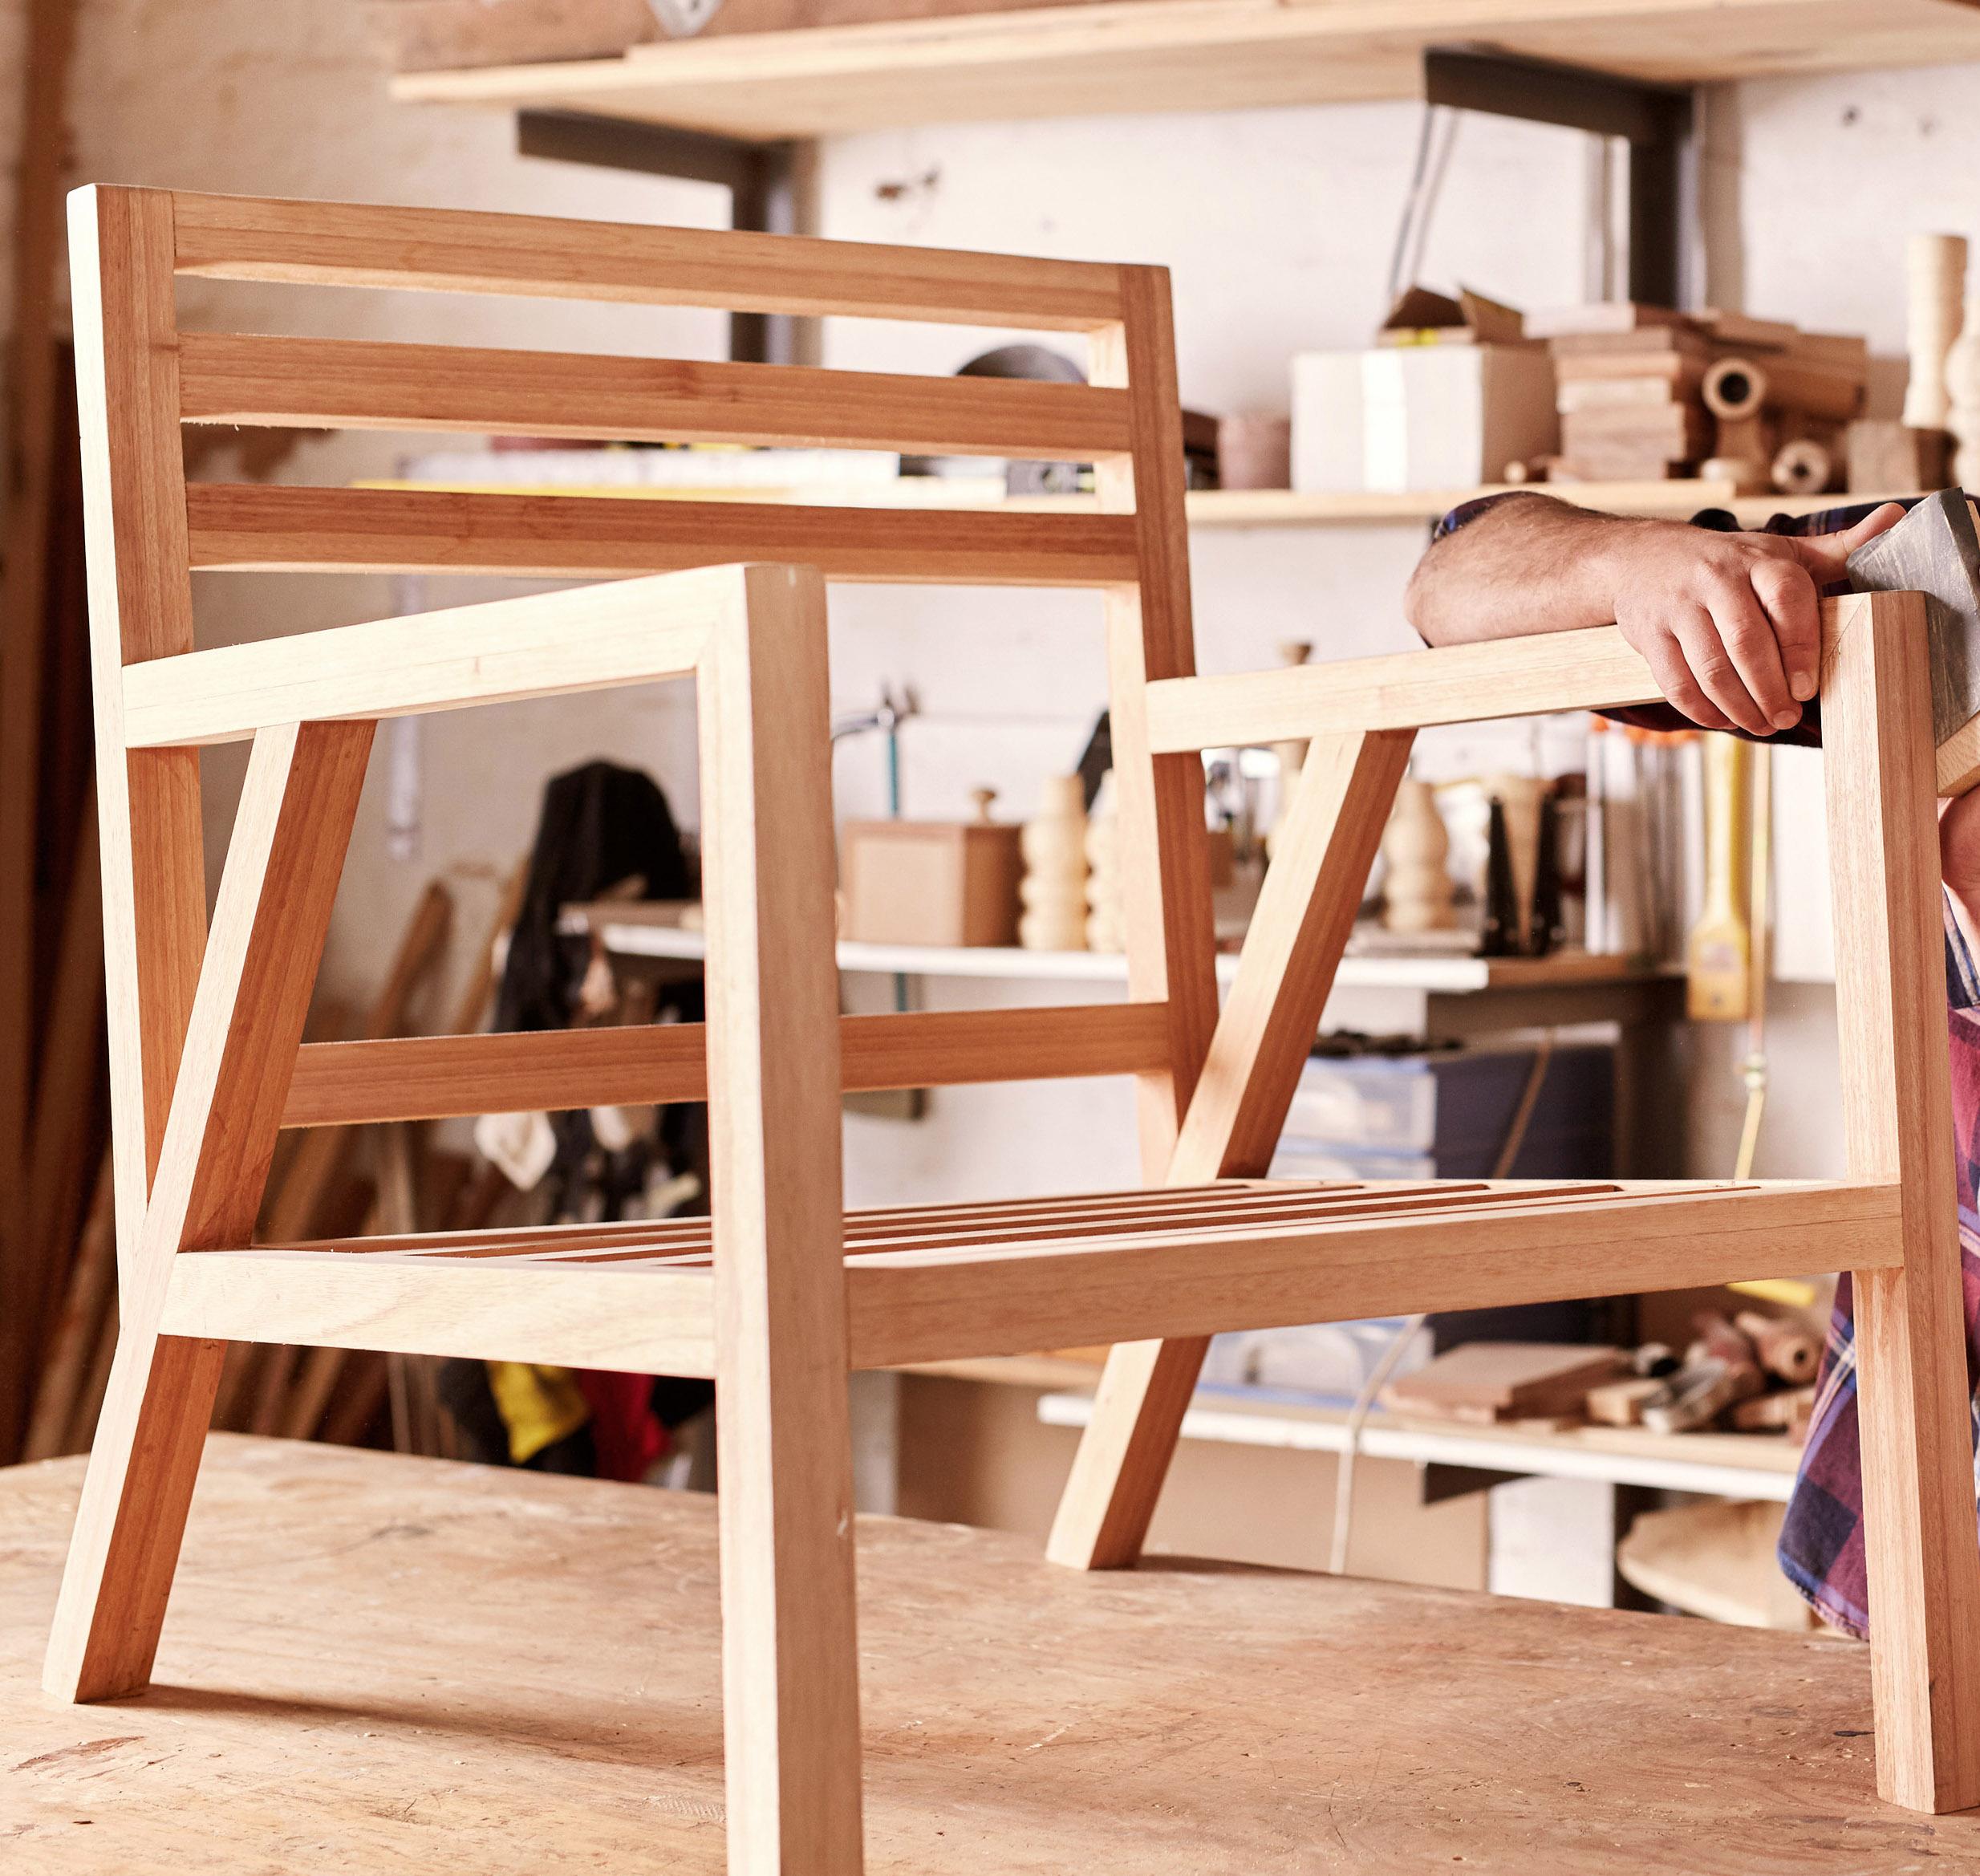 Cropped_Furniture Designer Sanding Wooden Chair Frame.jpg